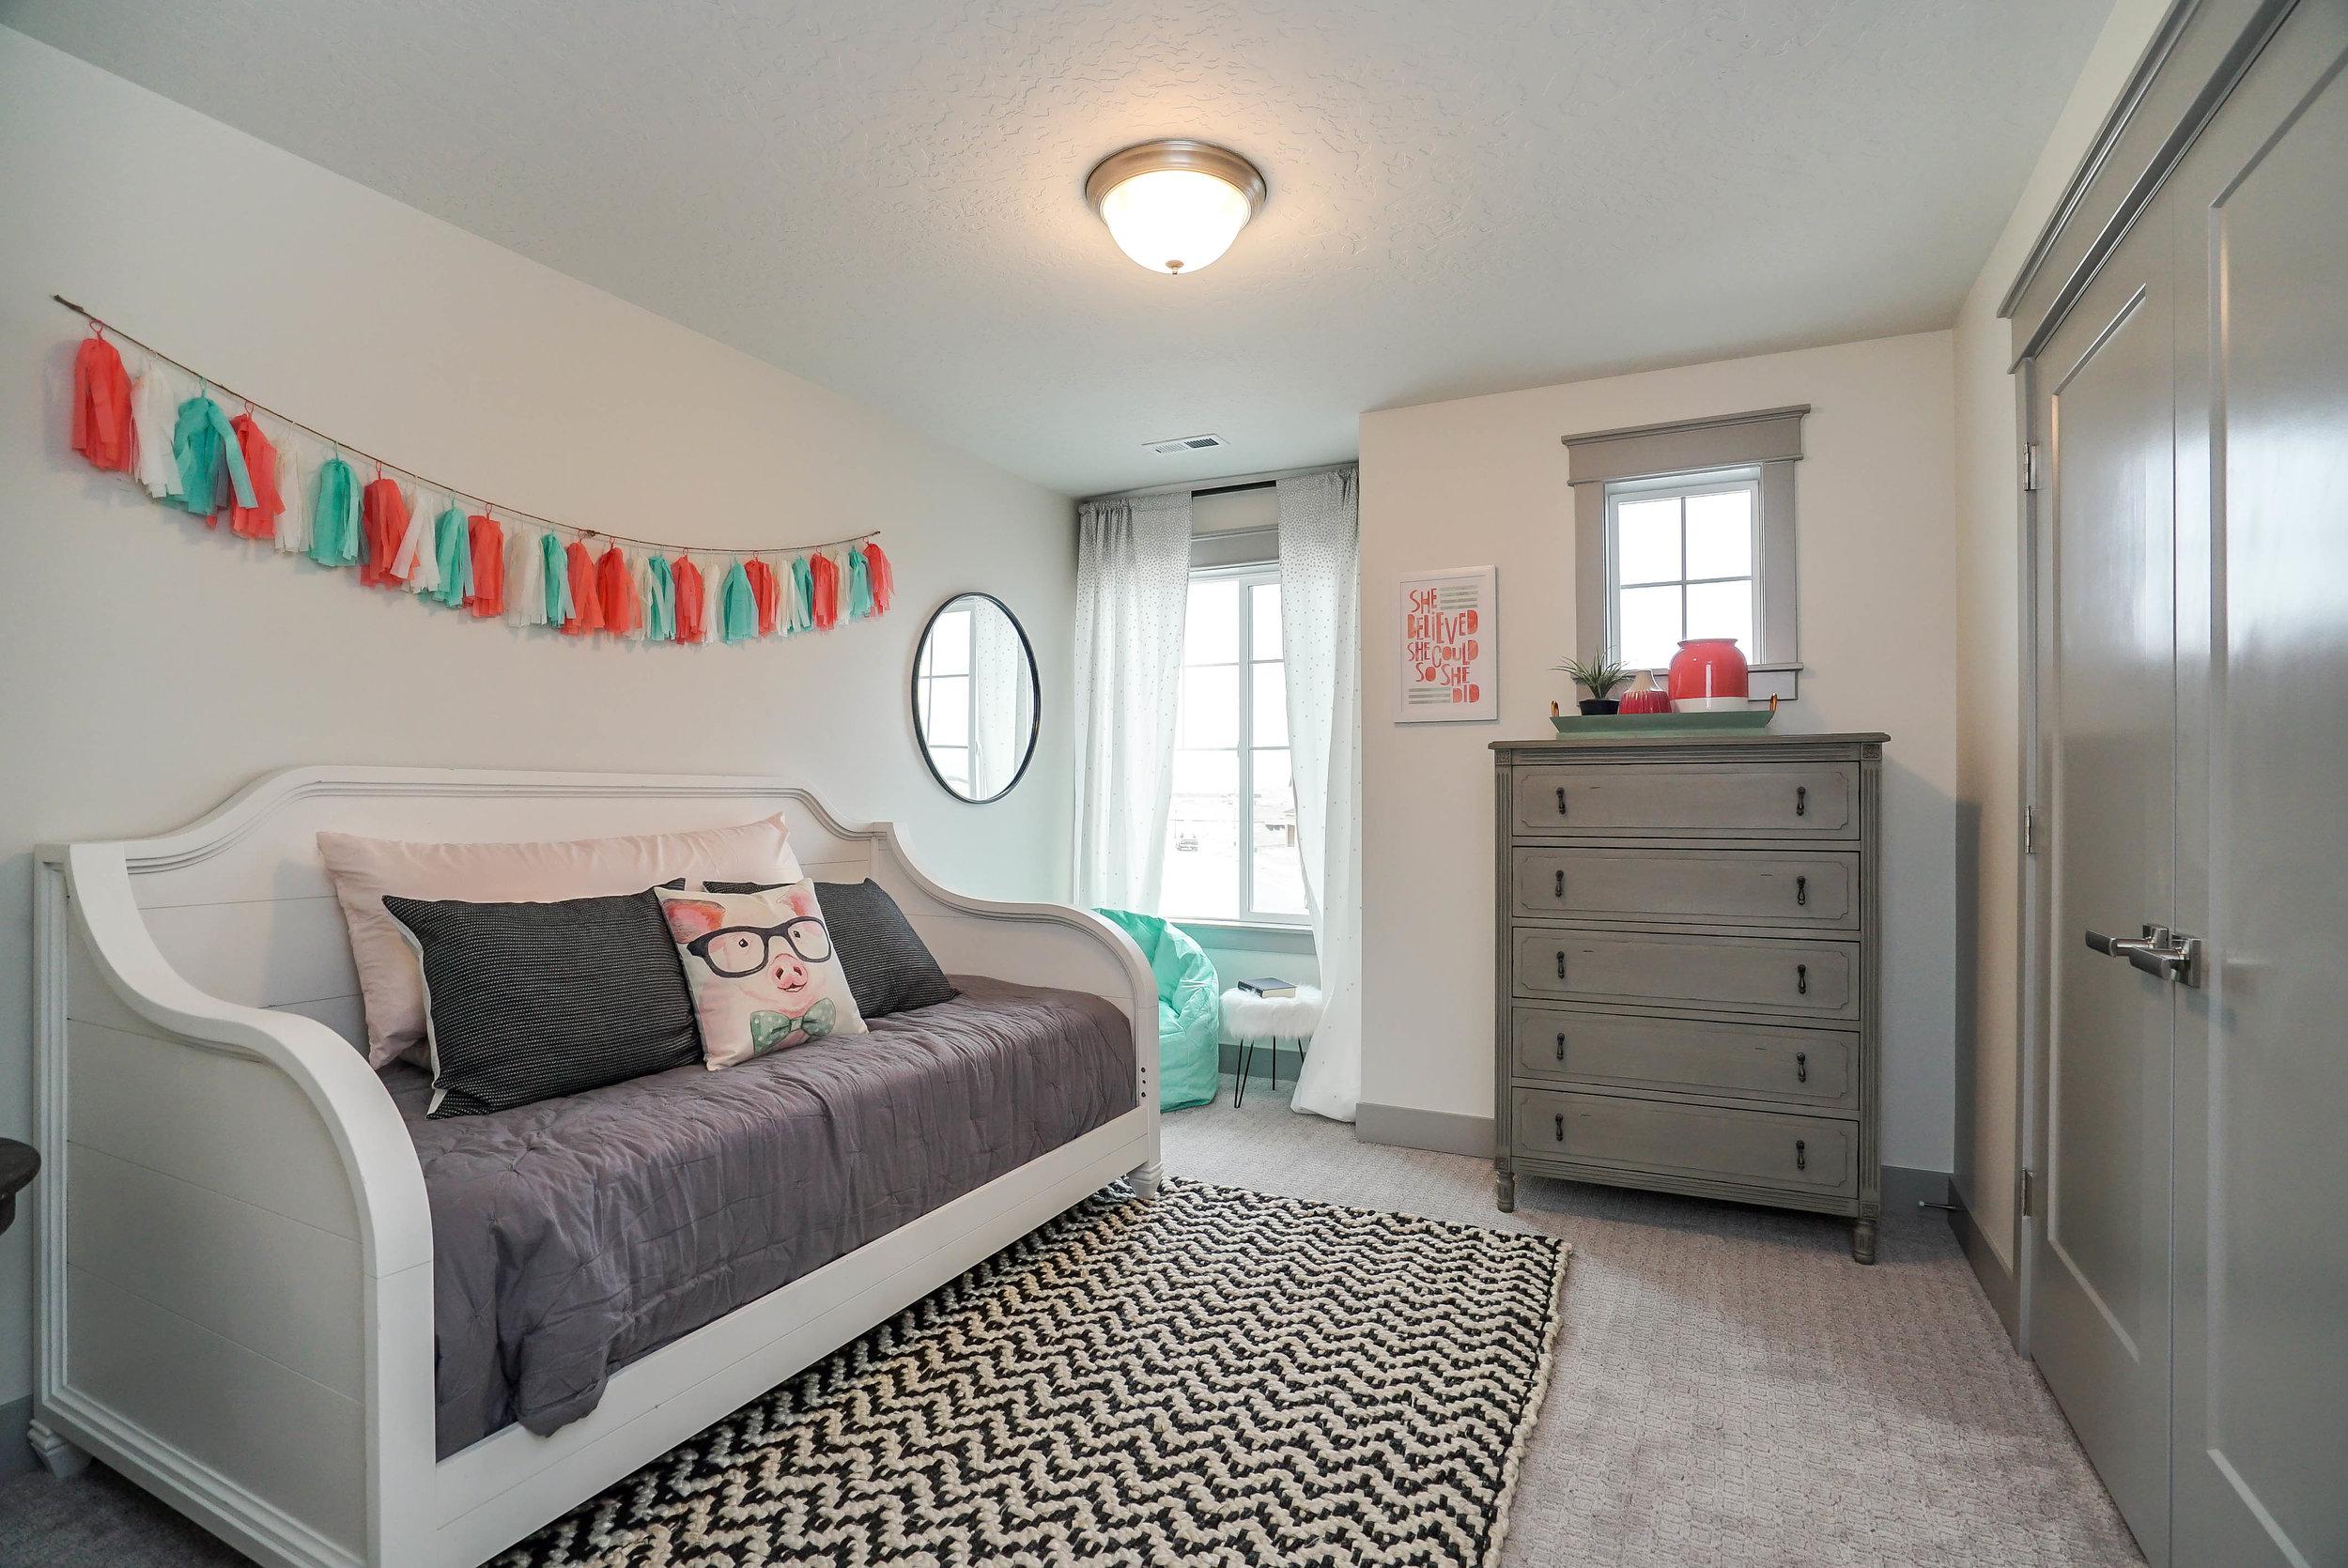 021_Bedroom.jpg